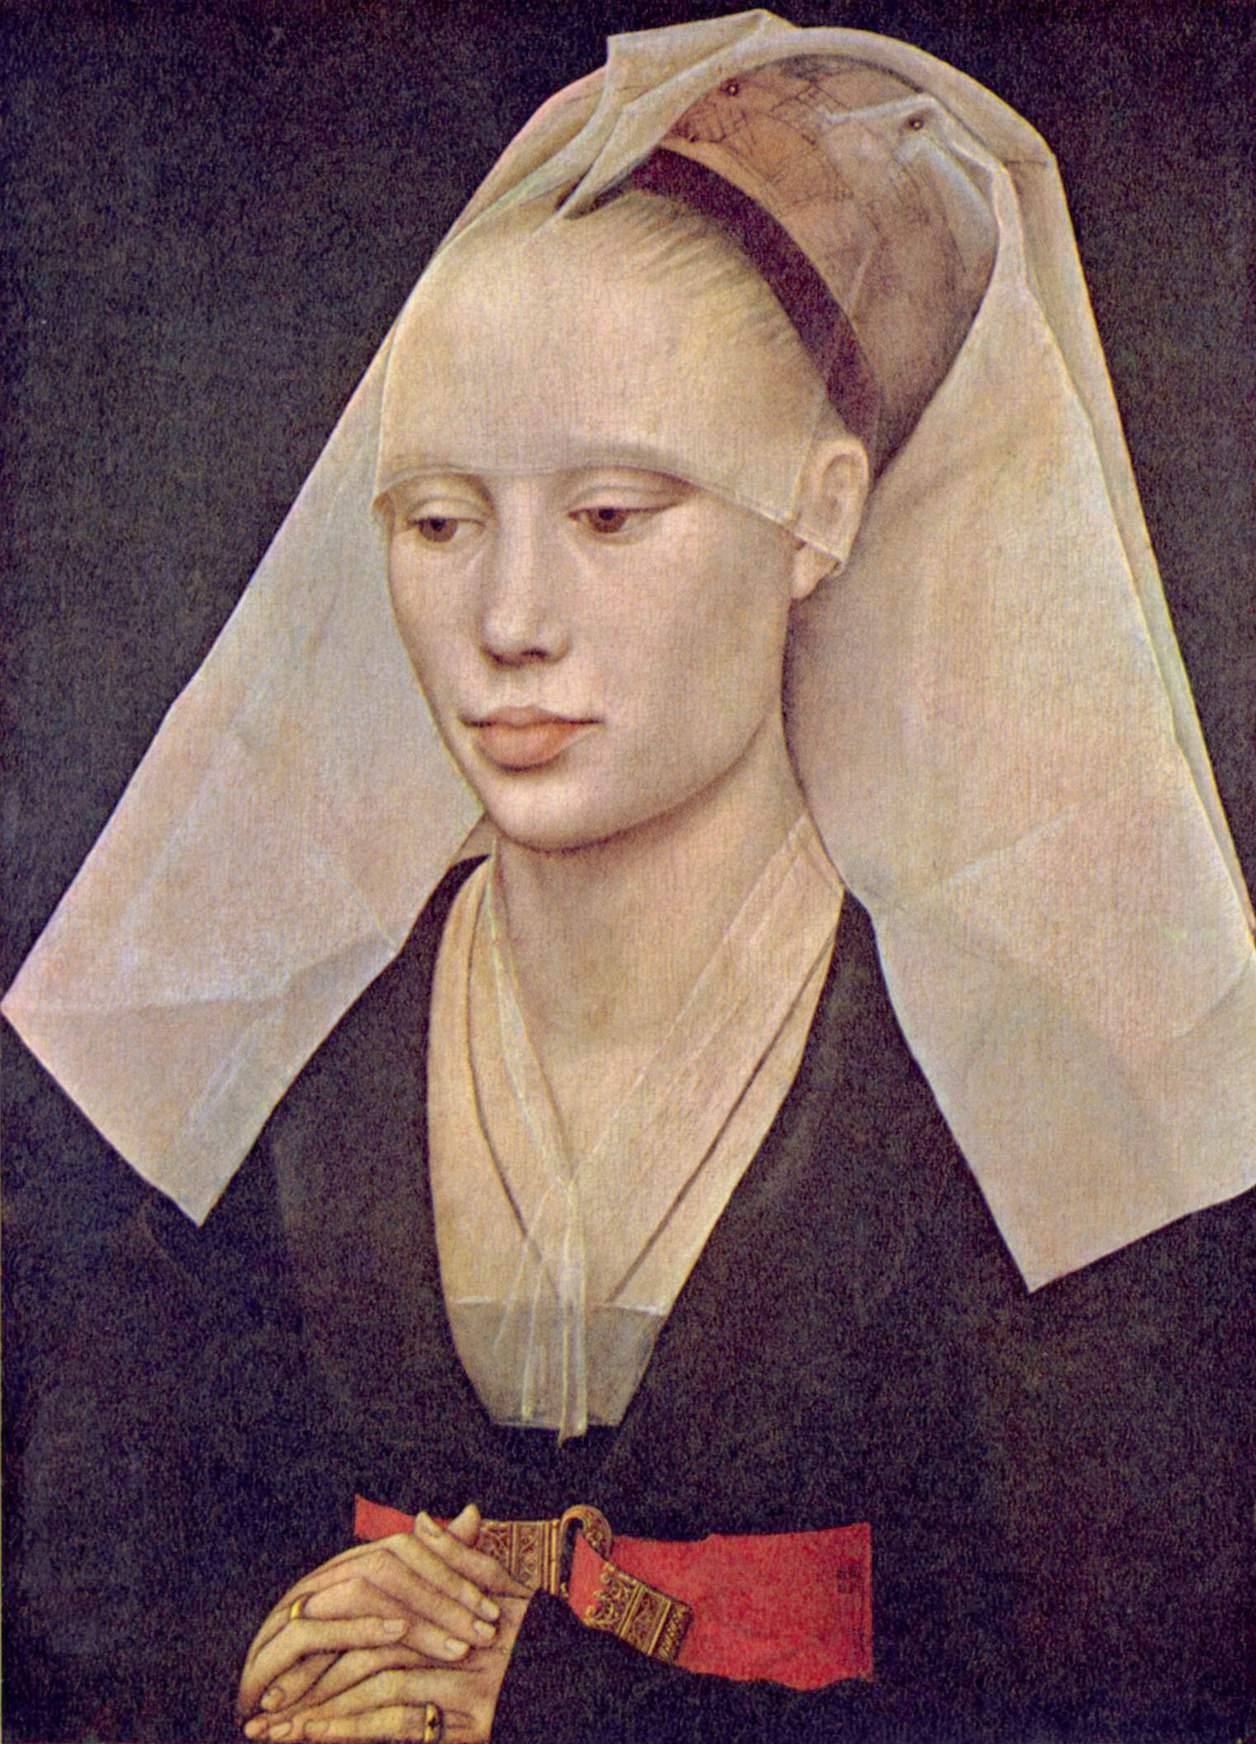 <img200*0:http://upload.wikimedia.org/wikipedia/commons/6/63/Rogier_van_der_Weyden_027.jpg>